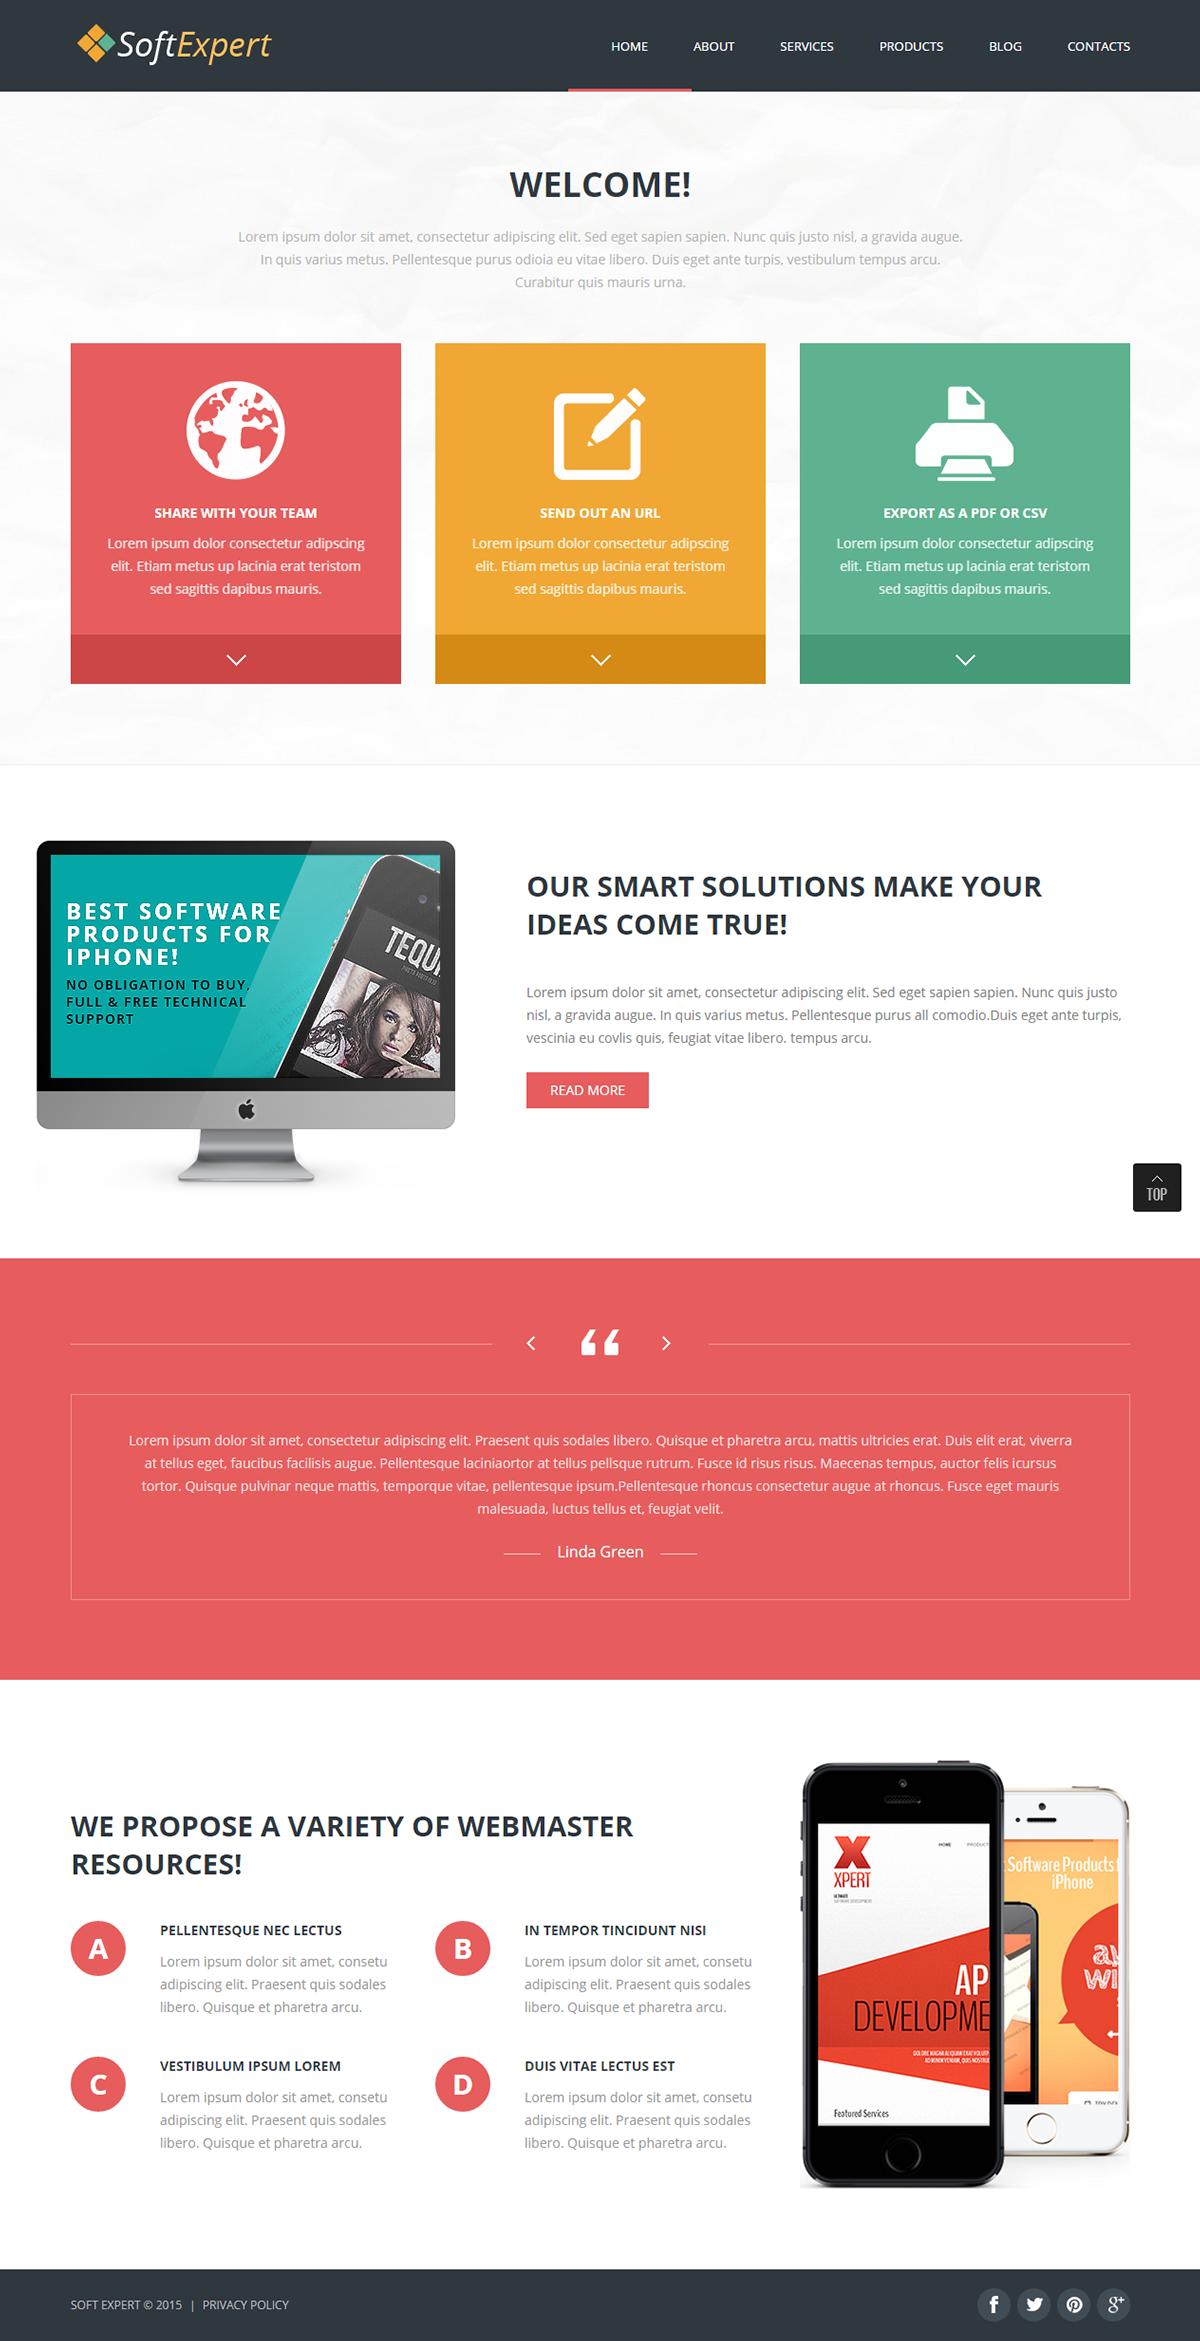 Software Development Joomla Template | Joomla Templates | Pinterest ...